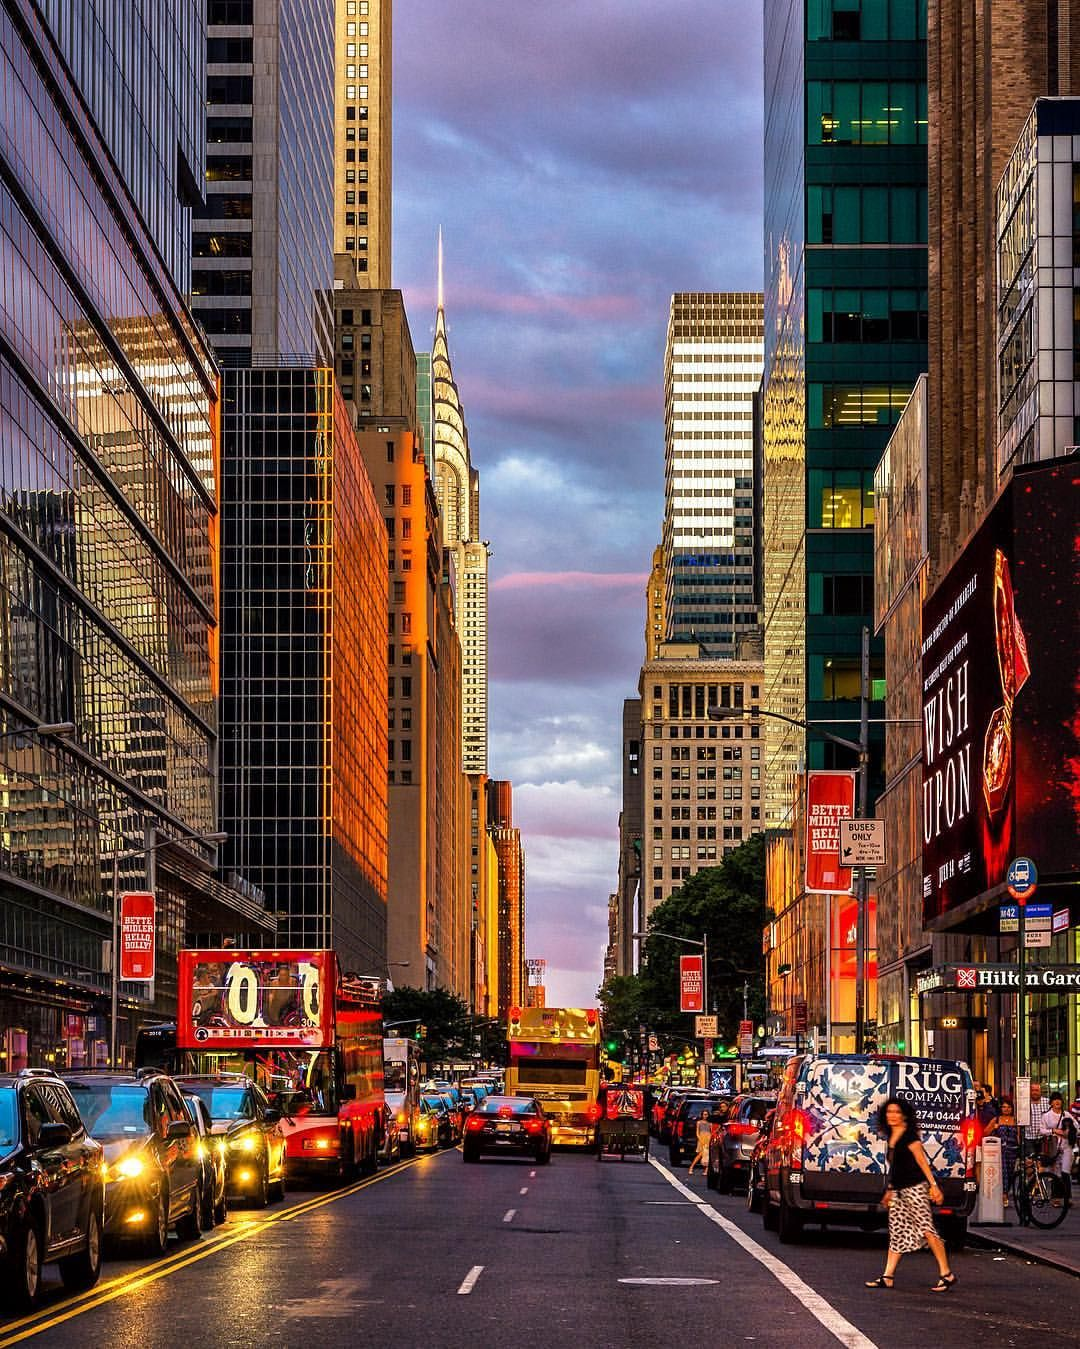 Ny Manhattan: 42nd Street New York City